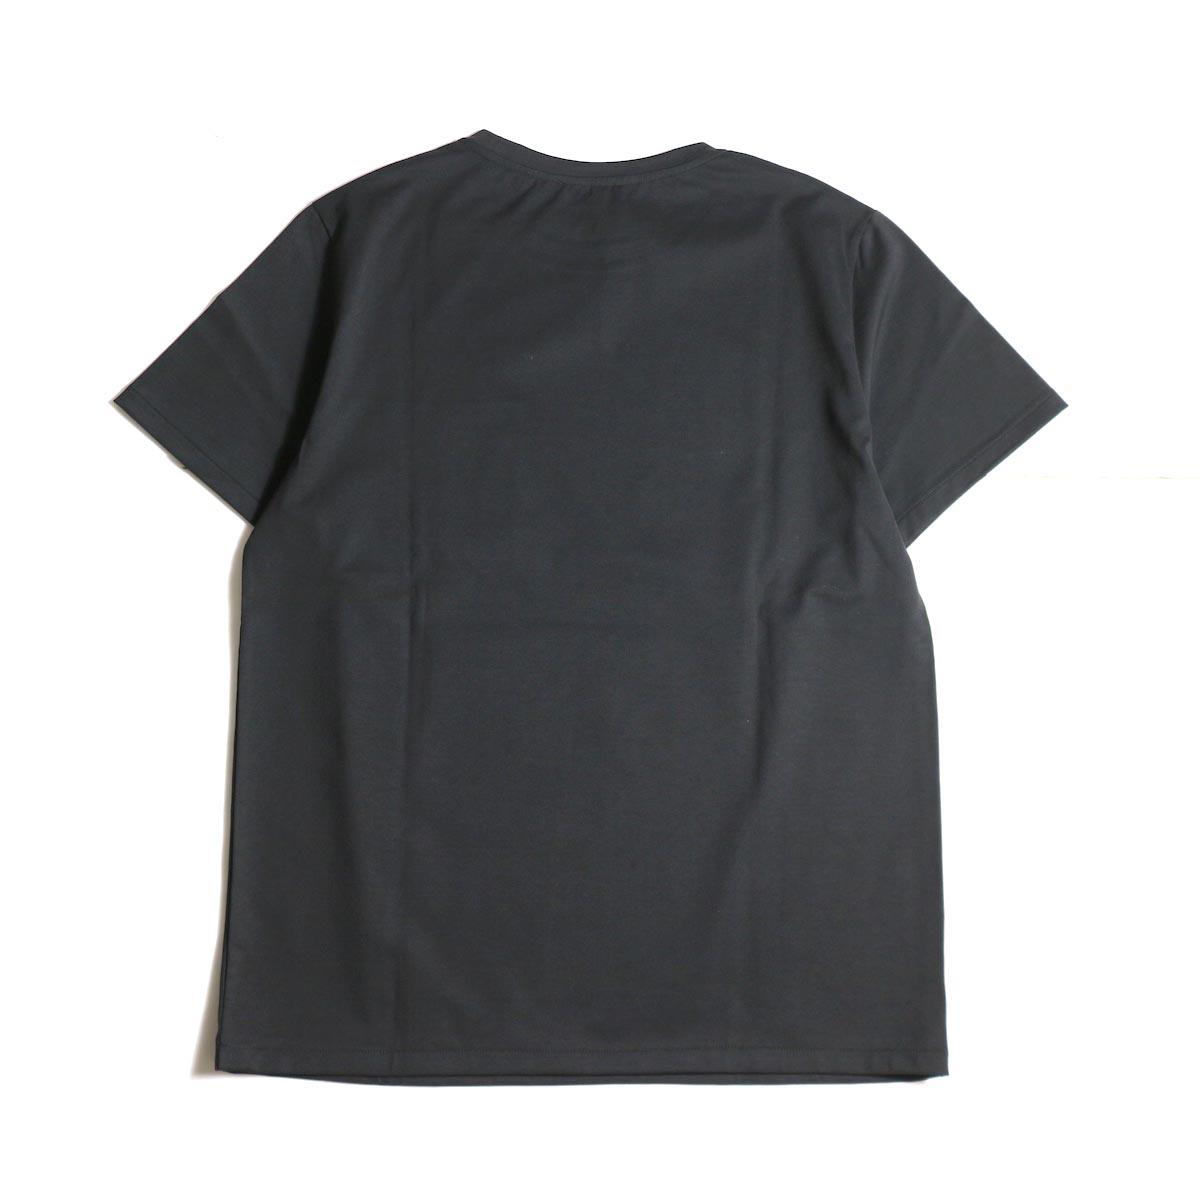 A.P.C. / Crew Neck Emb Pocket Tee -Black背面